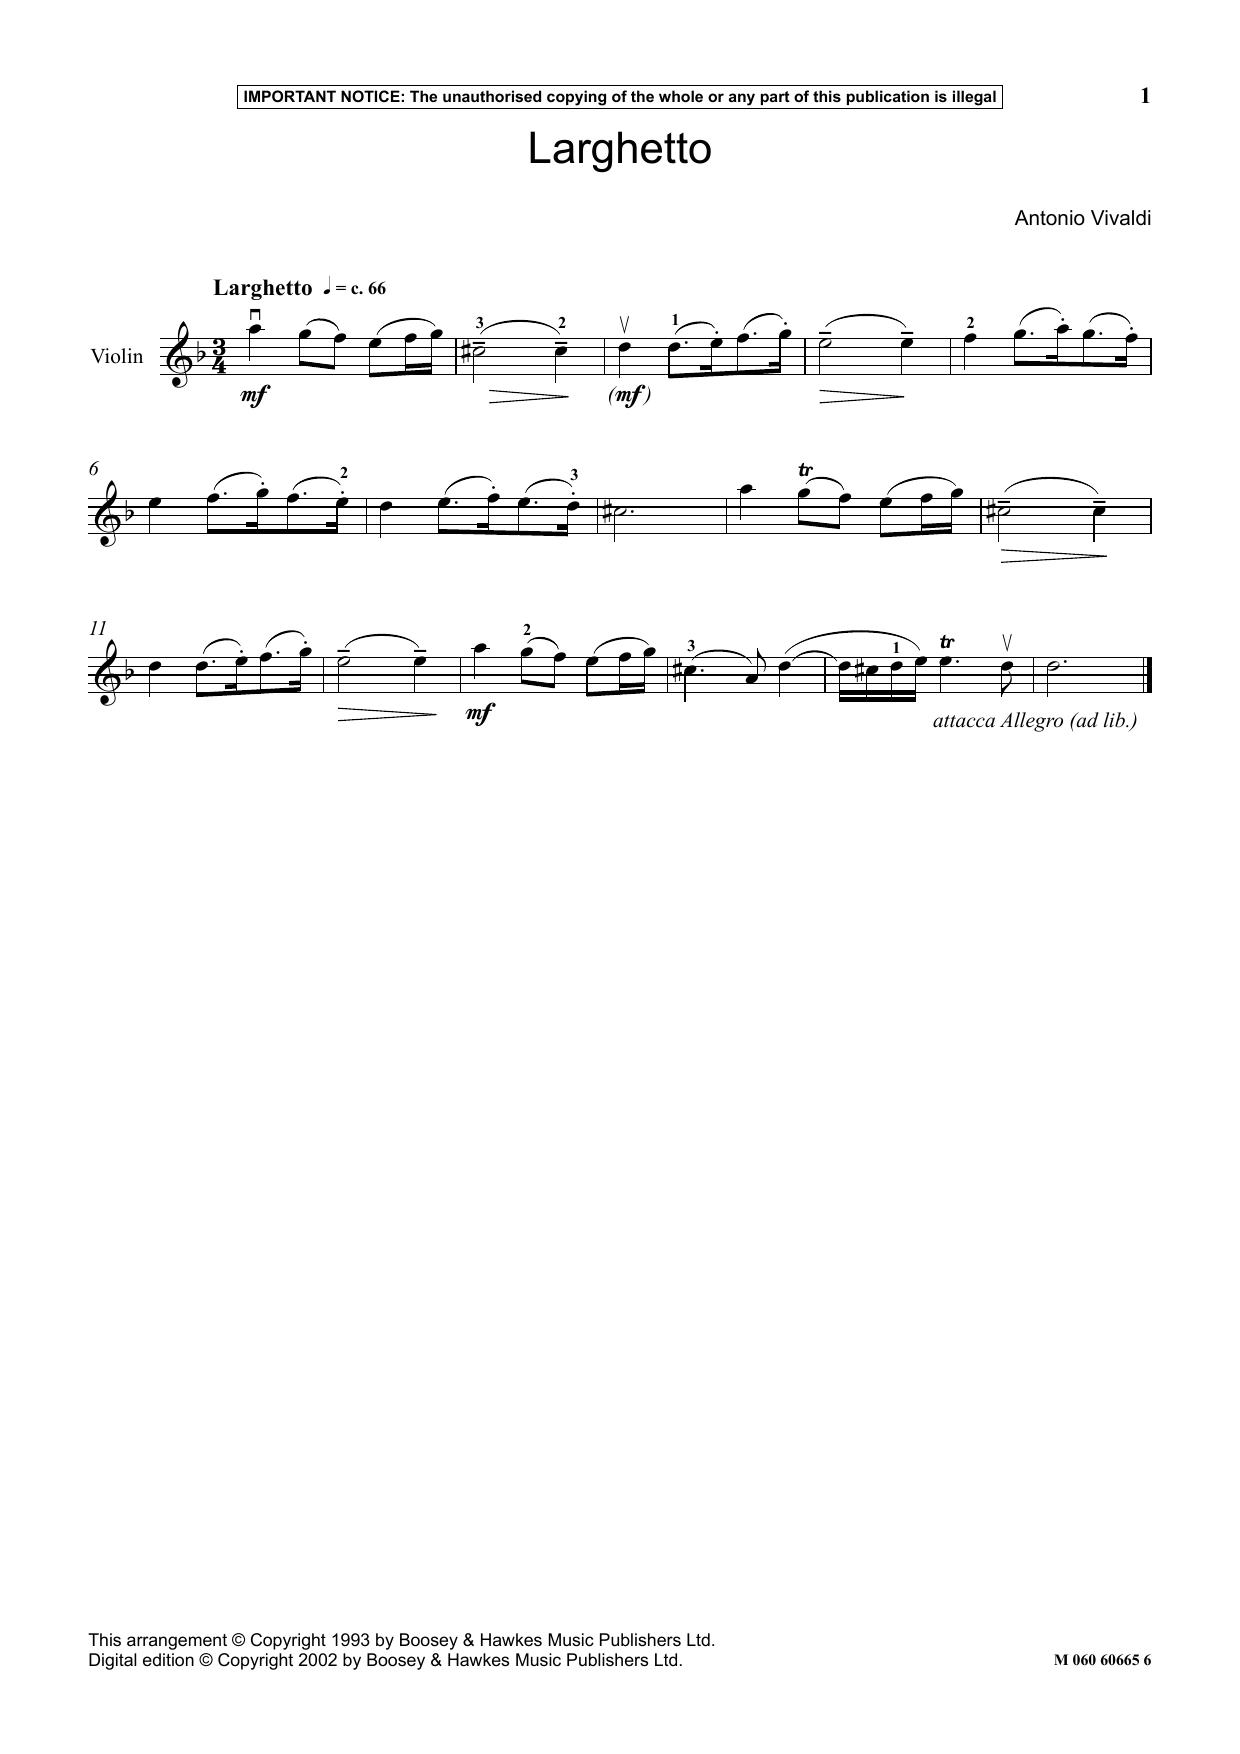 Sheet Music Digital Files To Print - Licensed Antonio